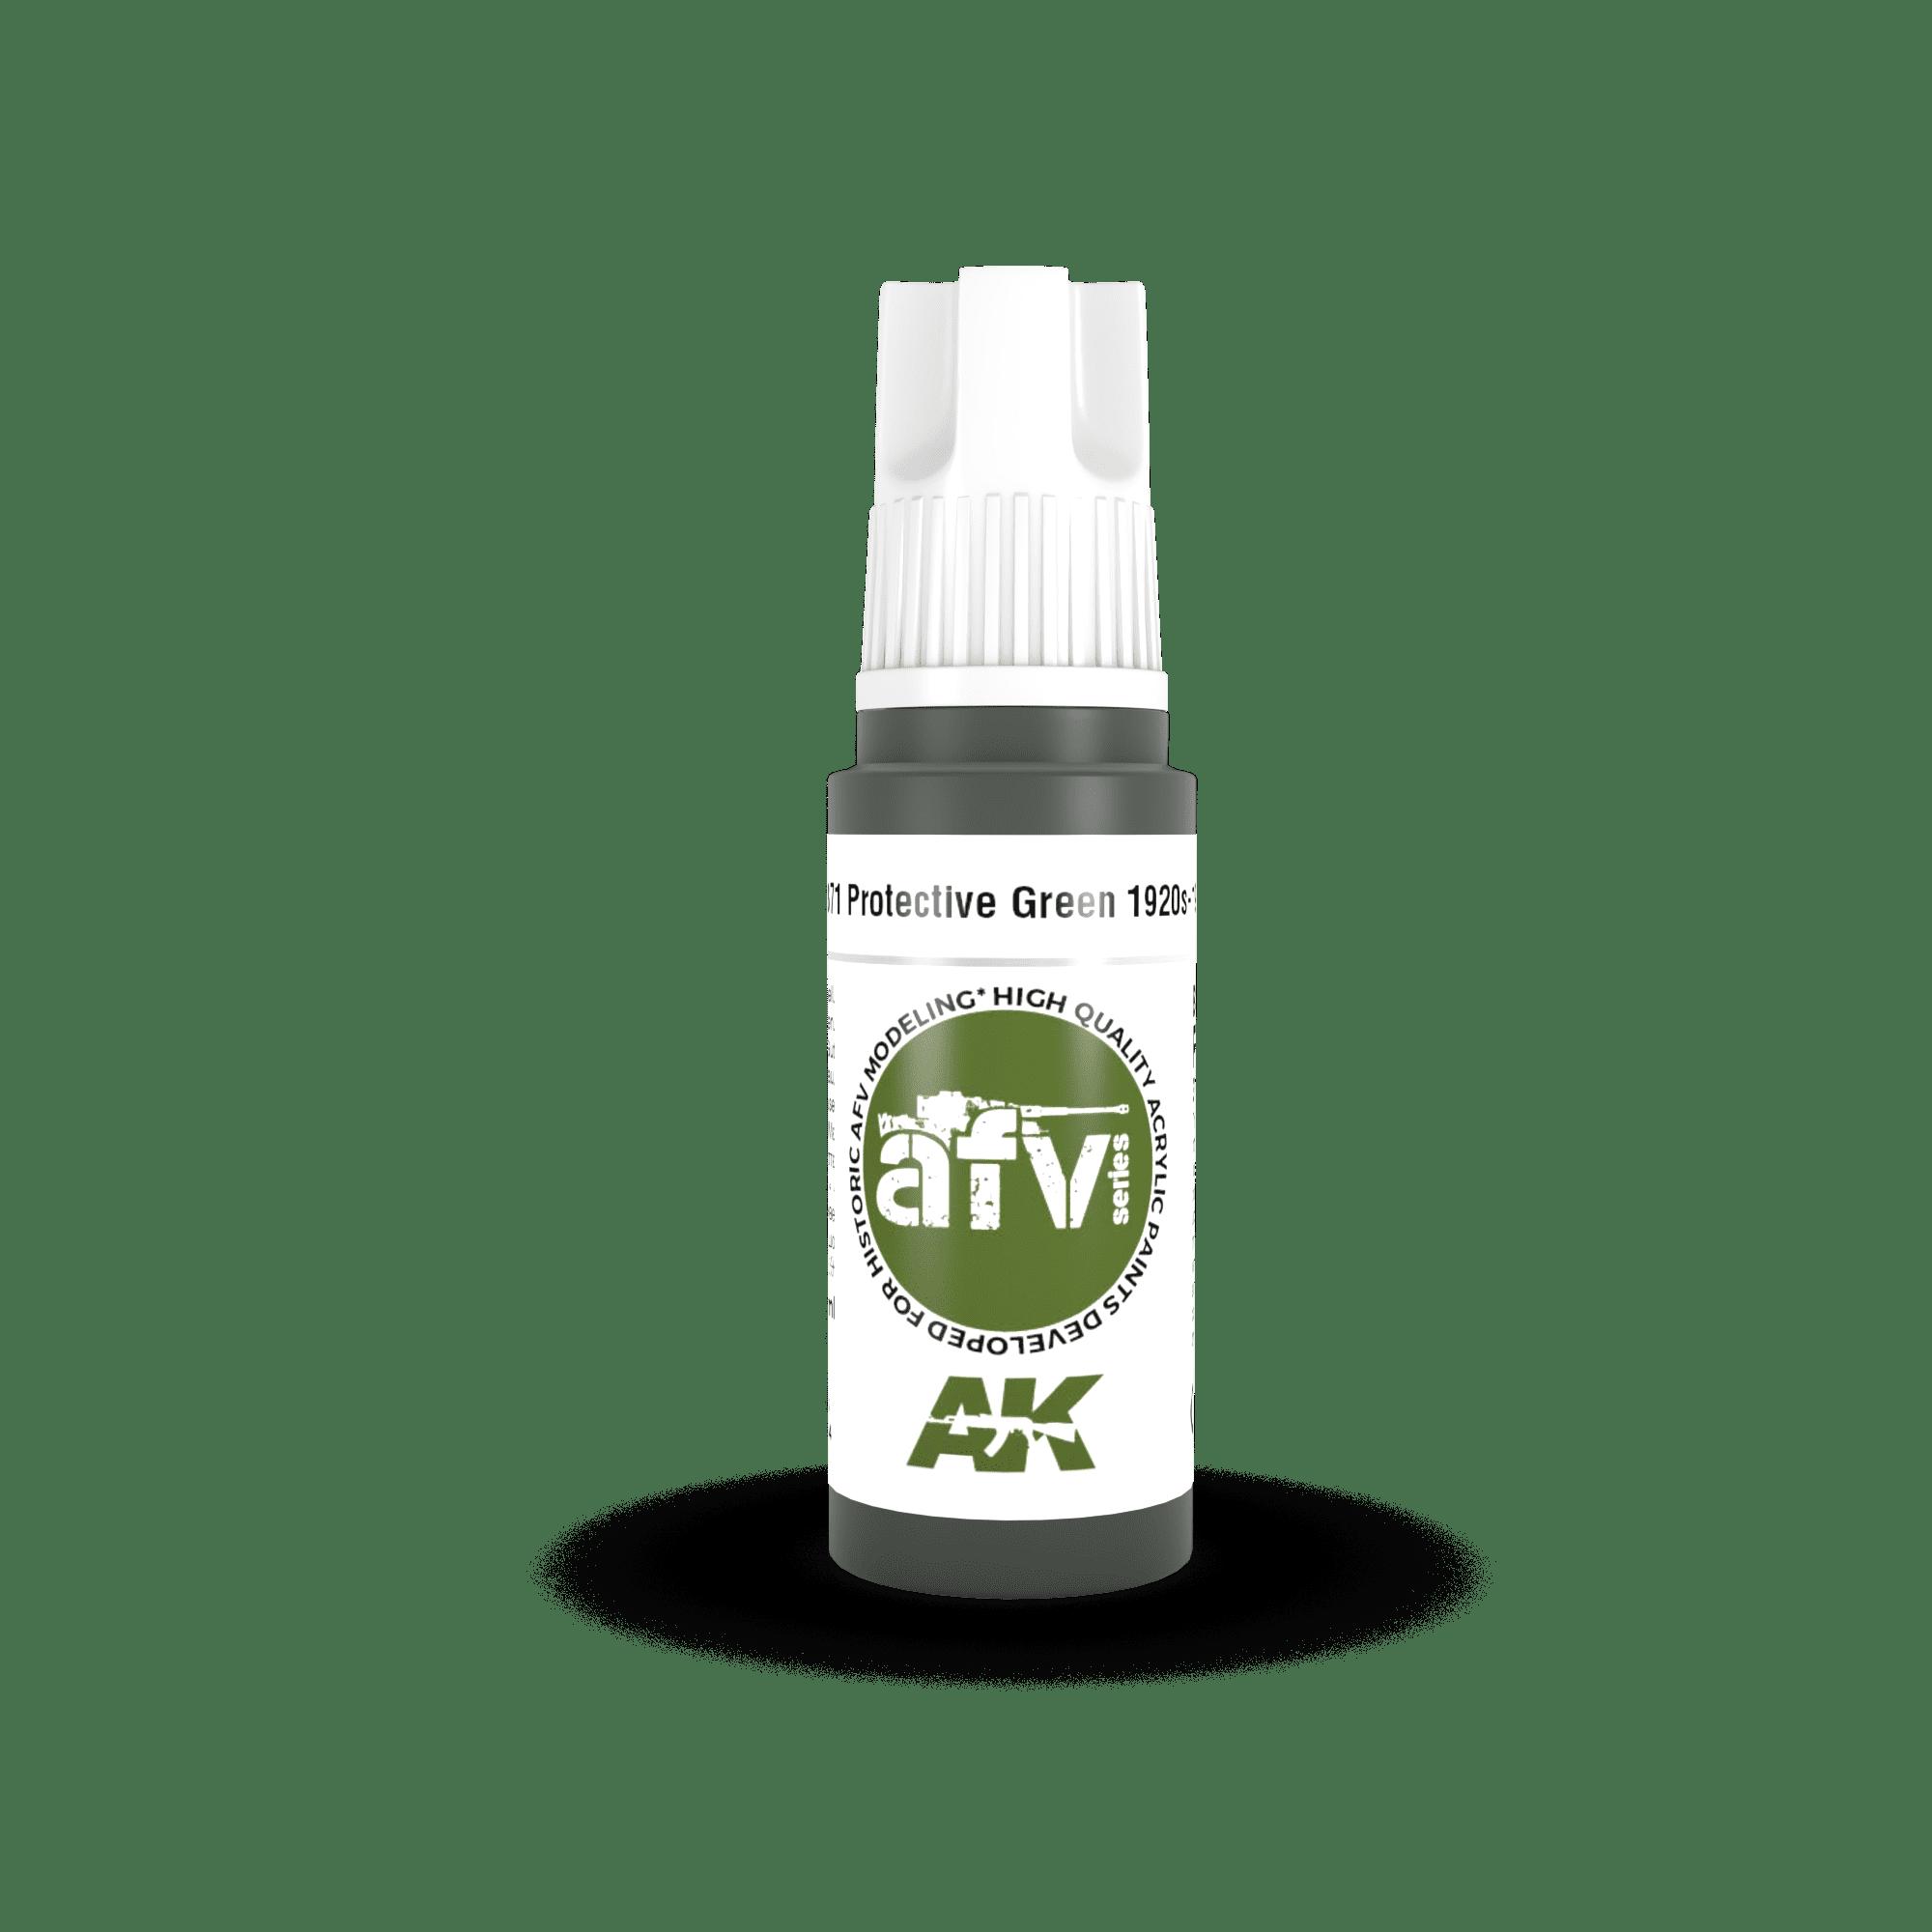 AK Interactive 3G Protective Green 1920s-1930s